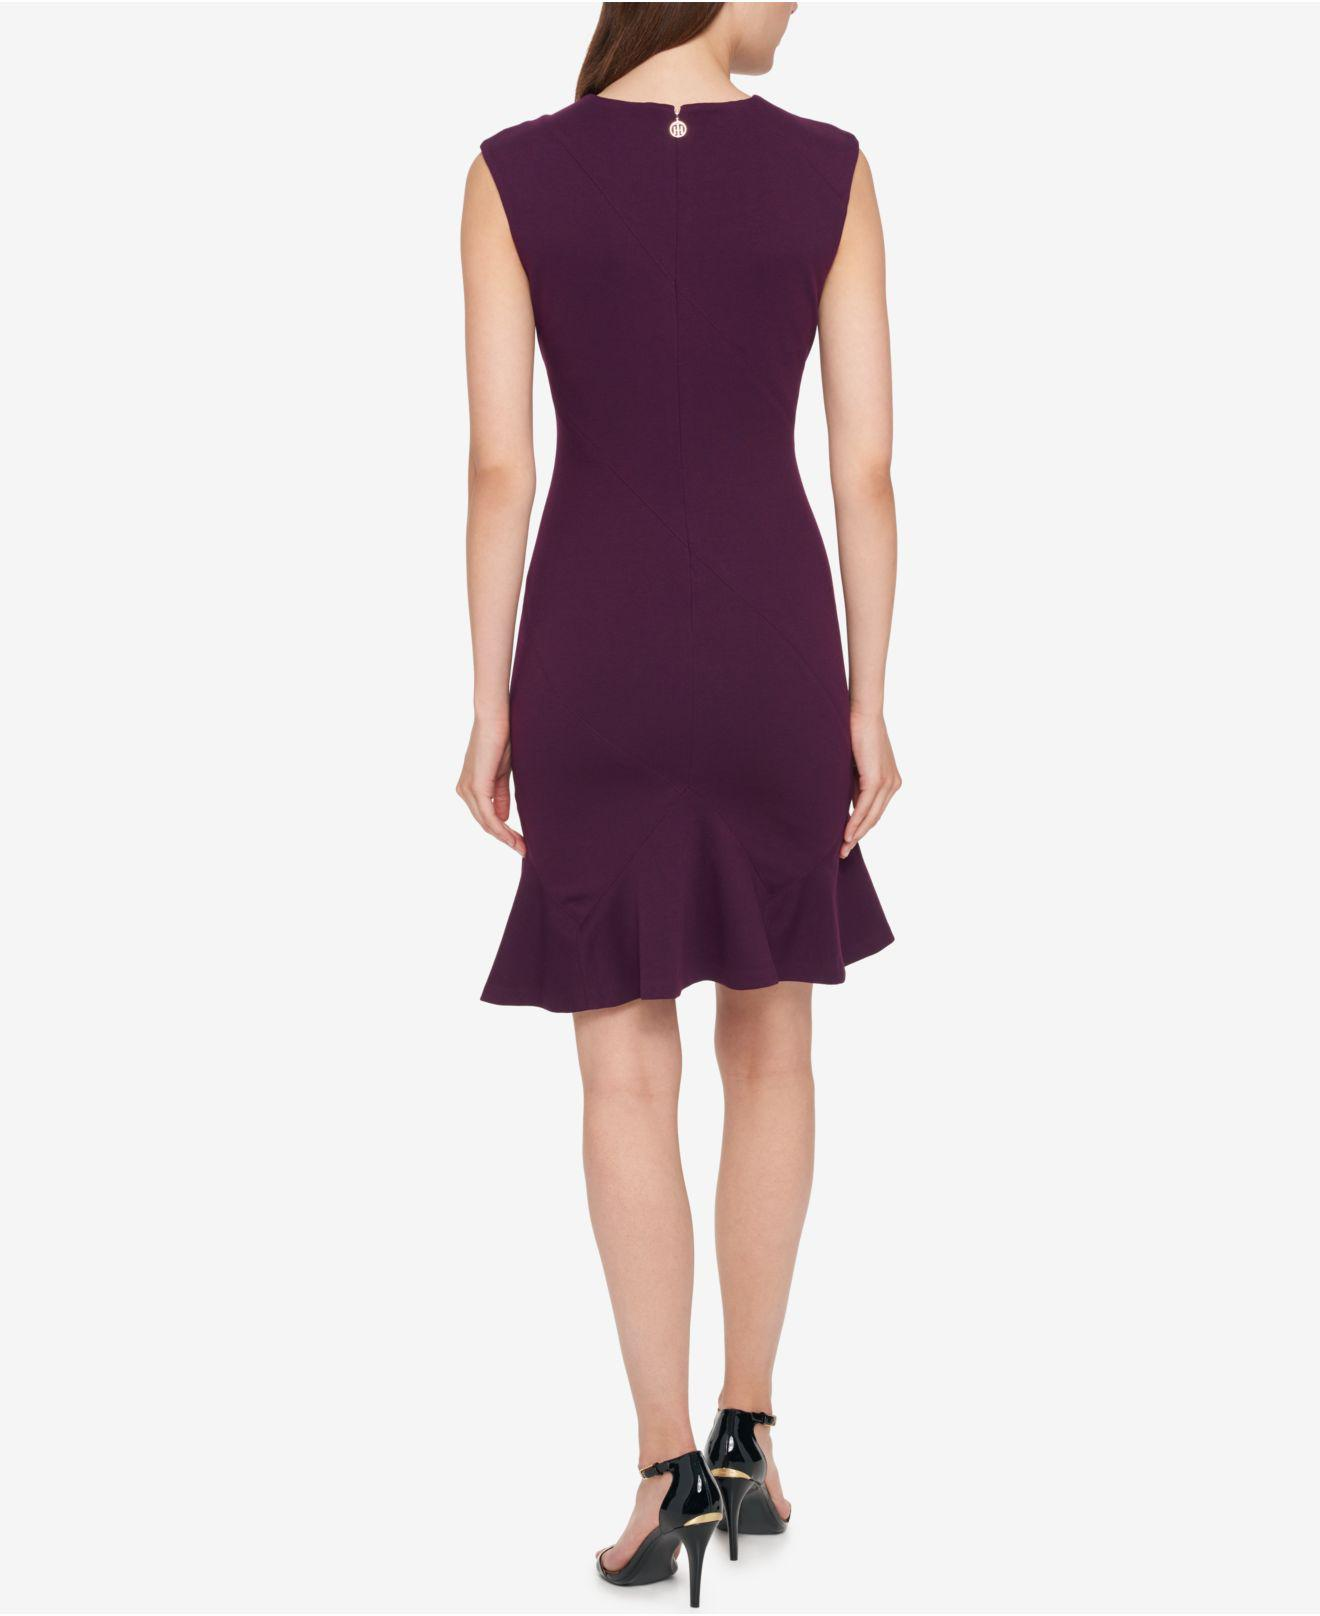 e2185131ec4f6 Tommy Hilfiger Flounce-hem Sheath Dress in Purple - Lyst